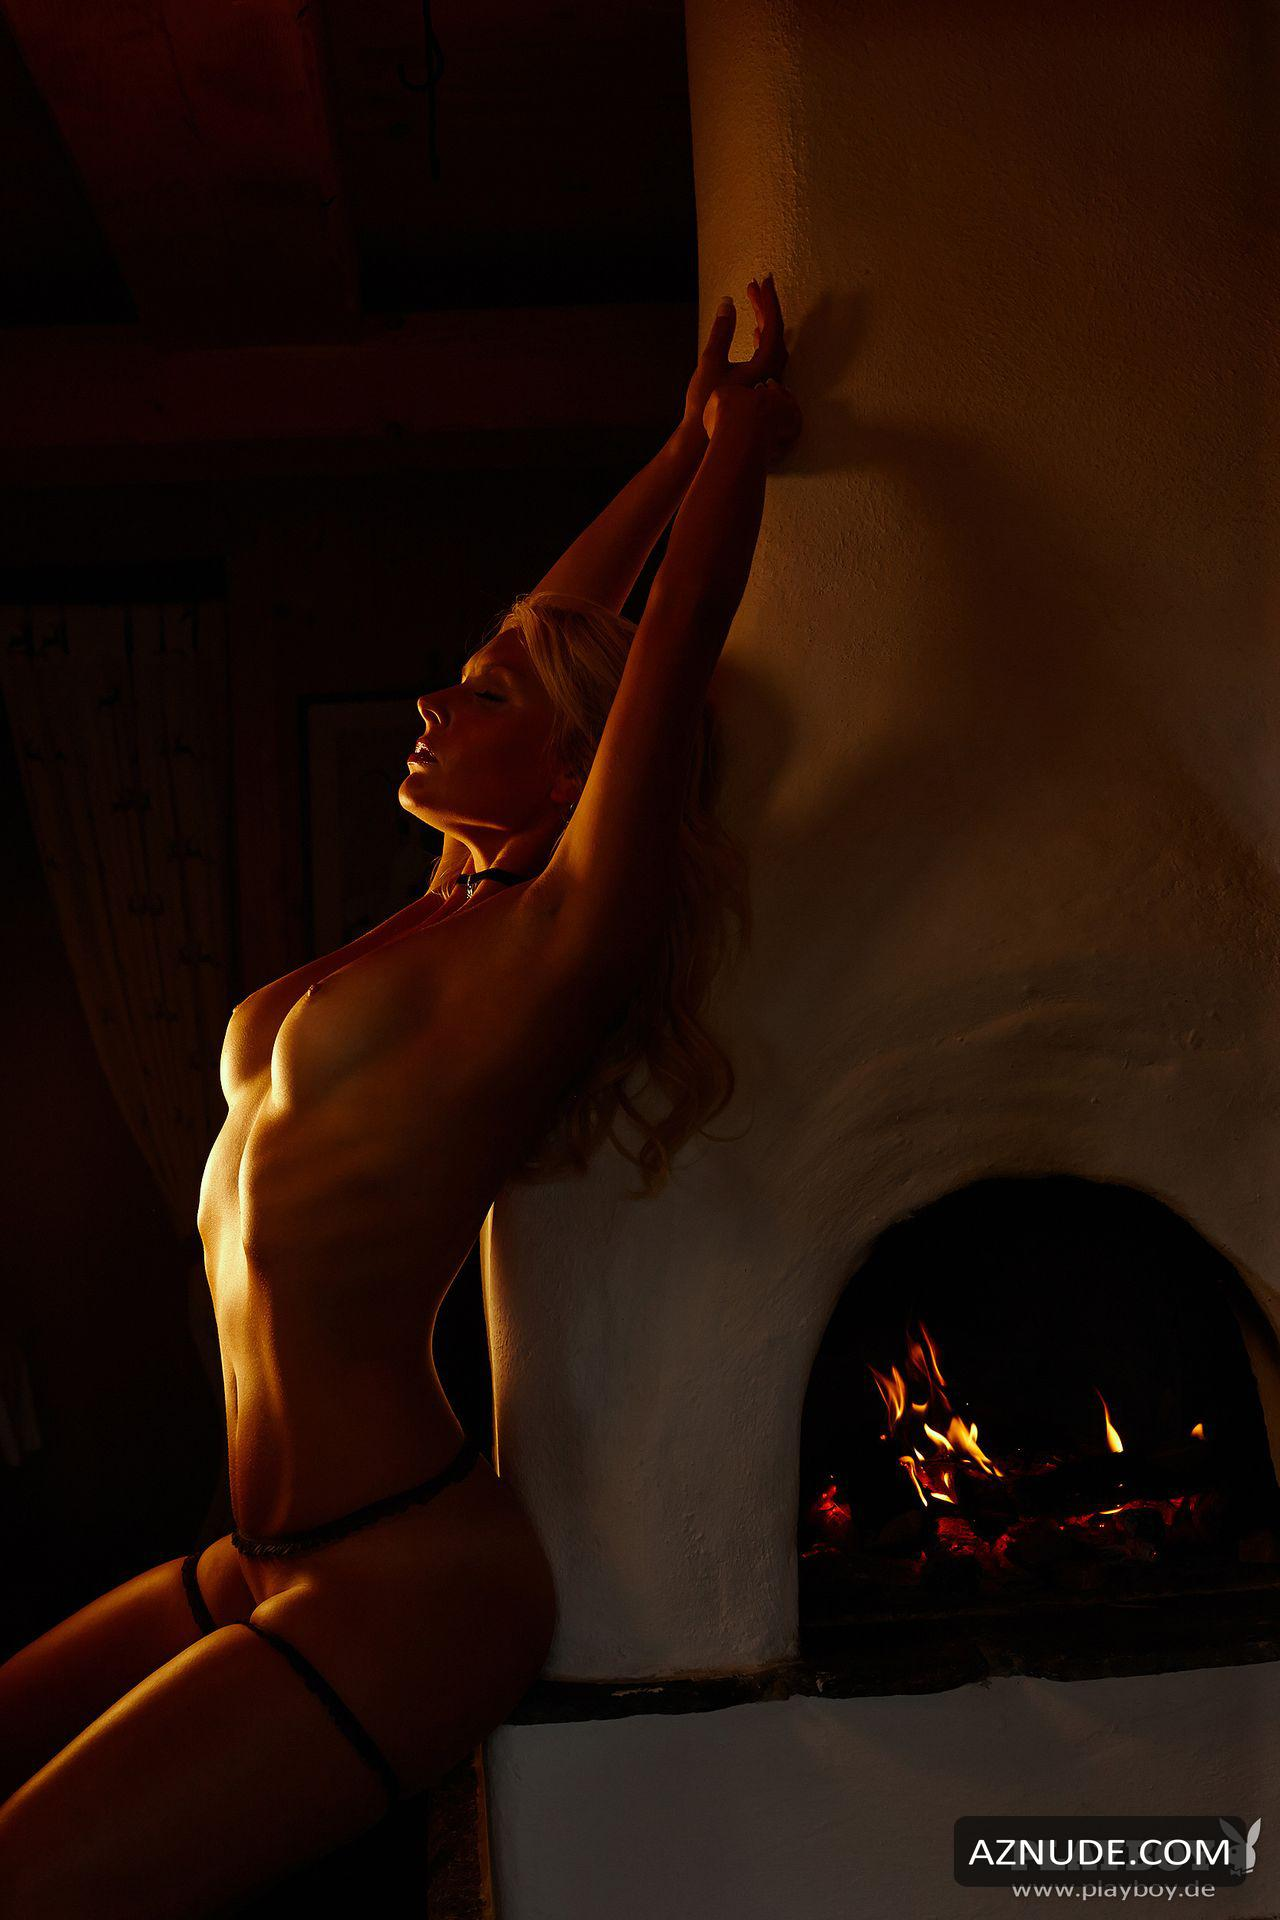 Denise Cotte Playboy